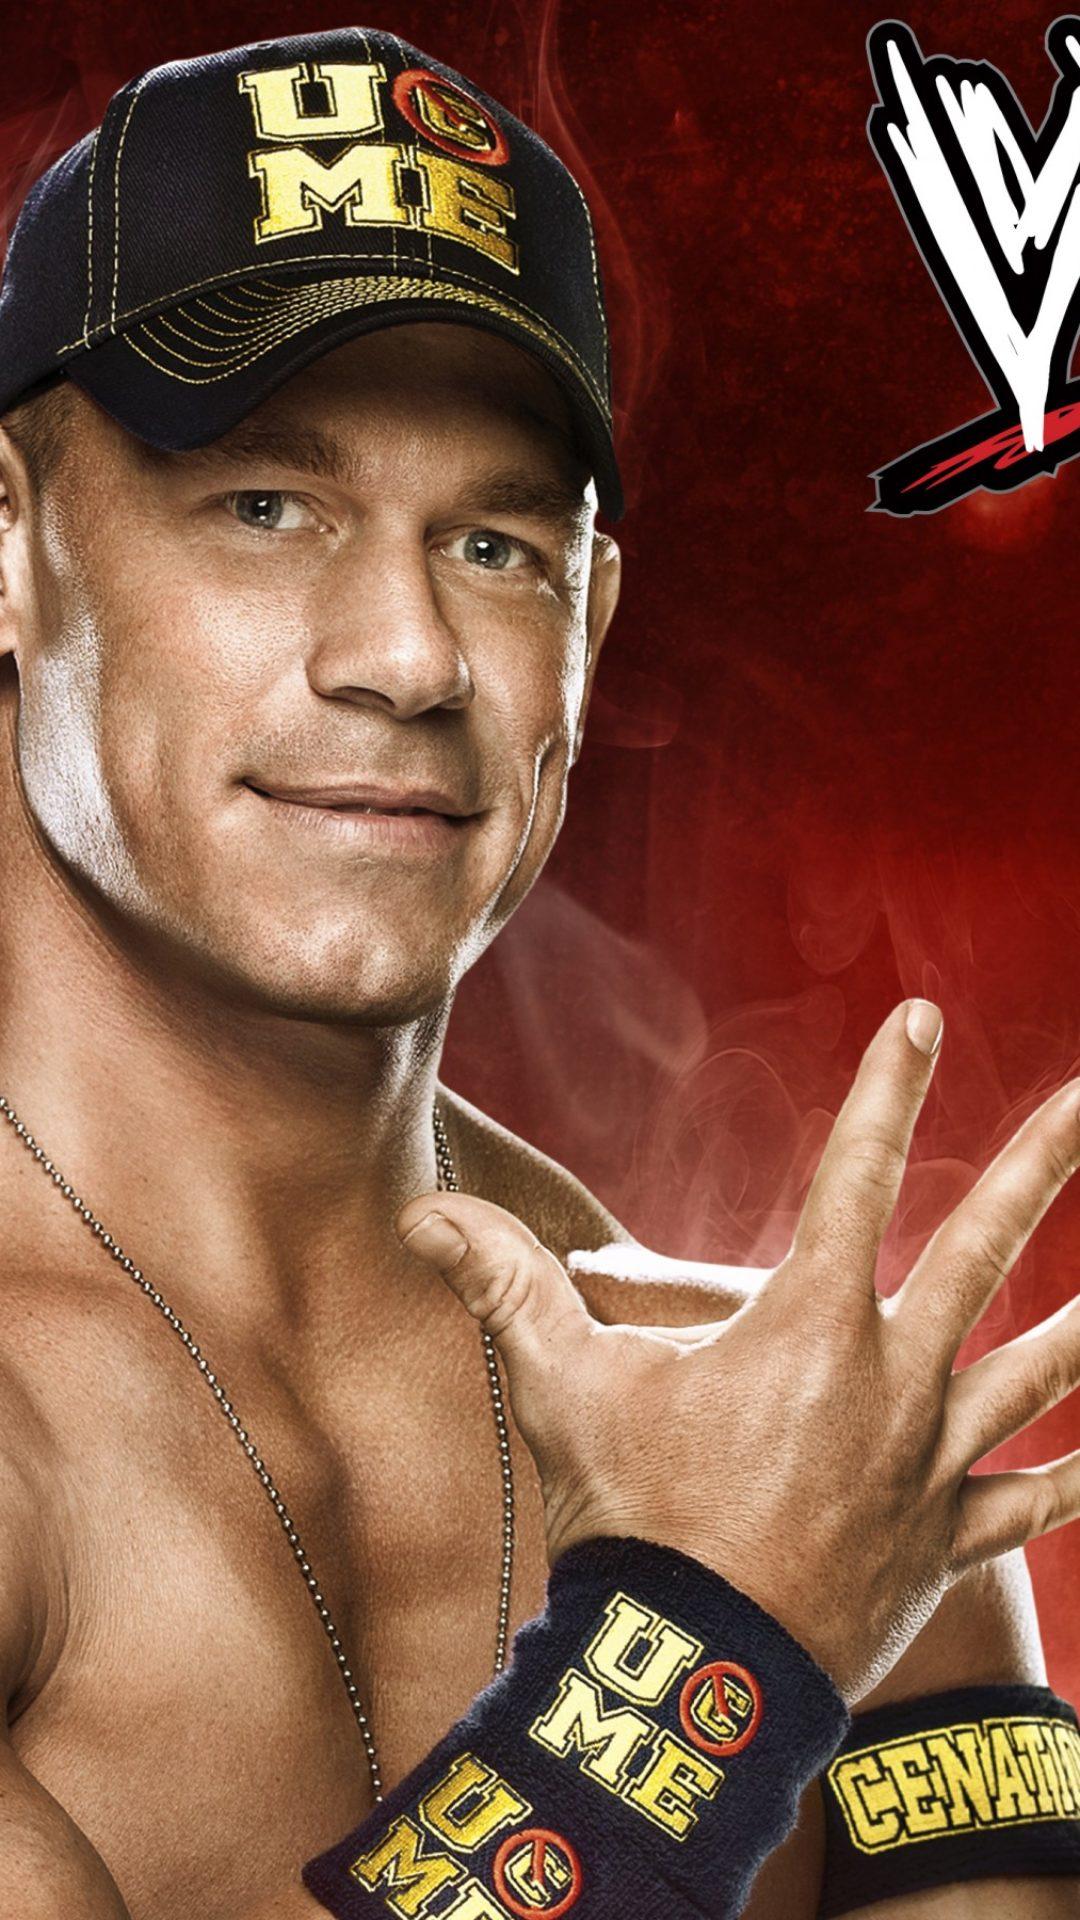 Download Wwe John Cena Hd Wallpapers 50   Wallpaper For 1080x1920